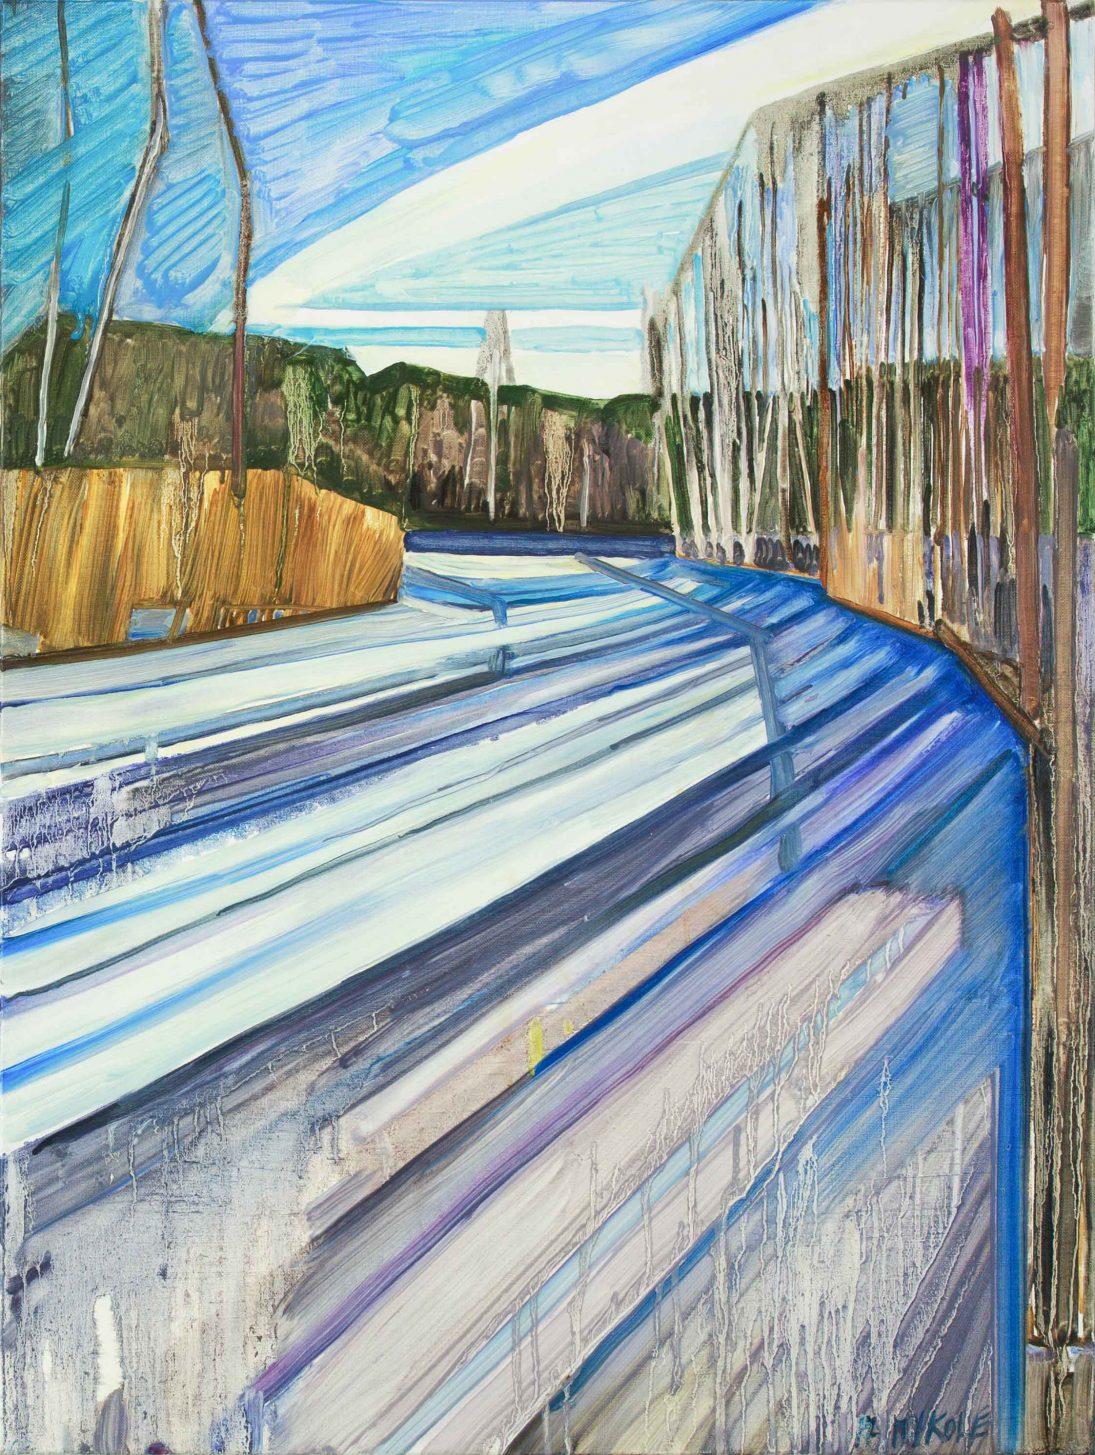 Saari 7-14. Oil, canvas. 80x60cm. 2017